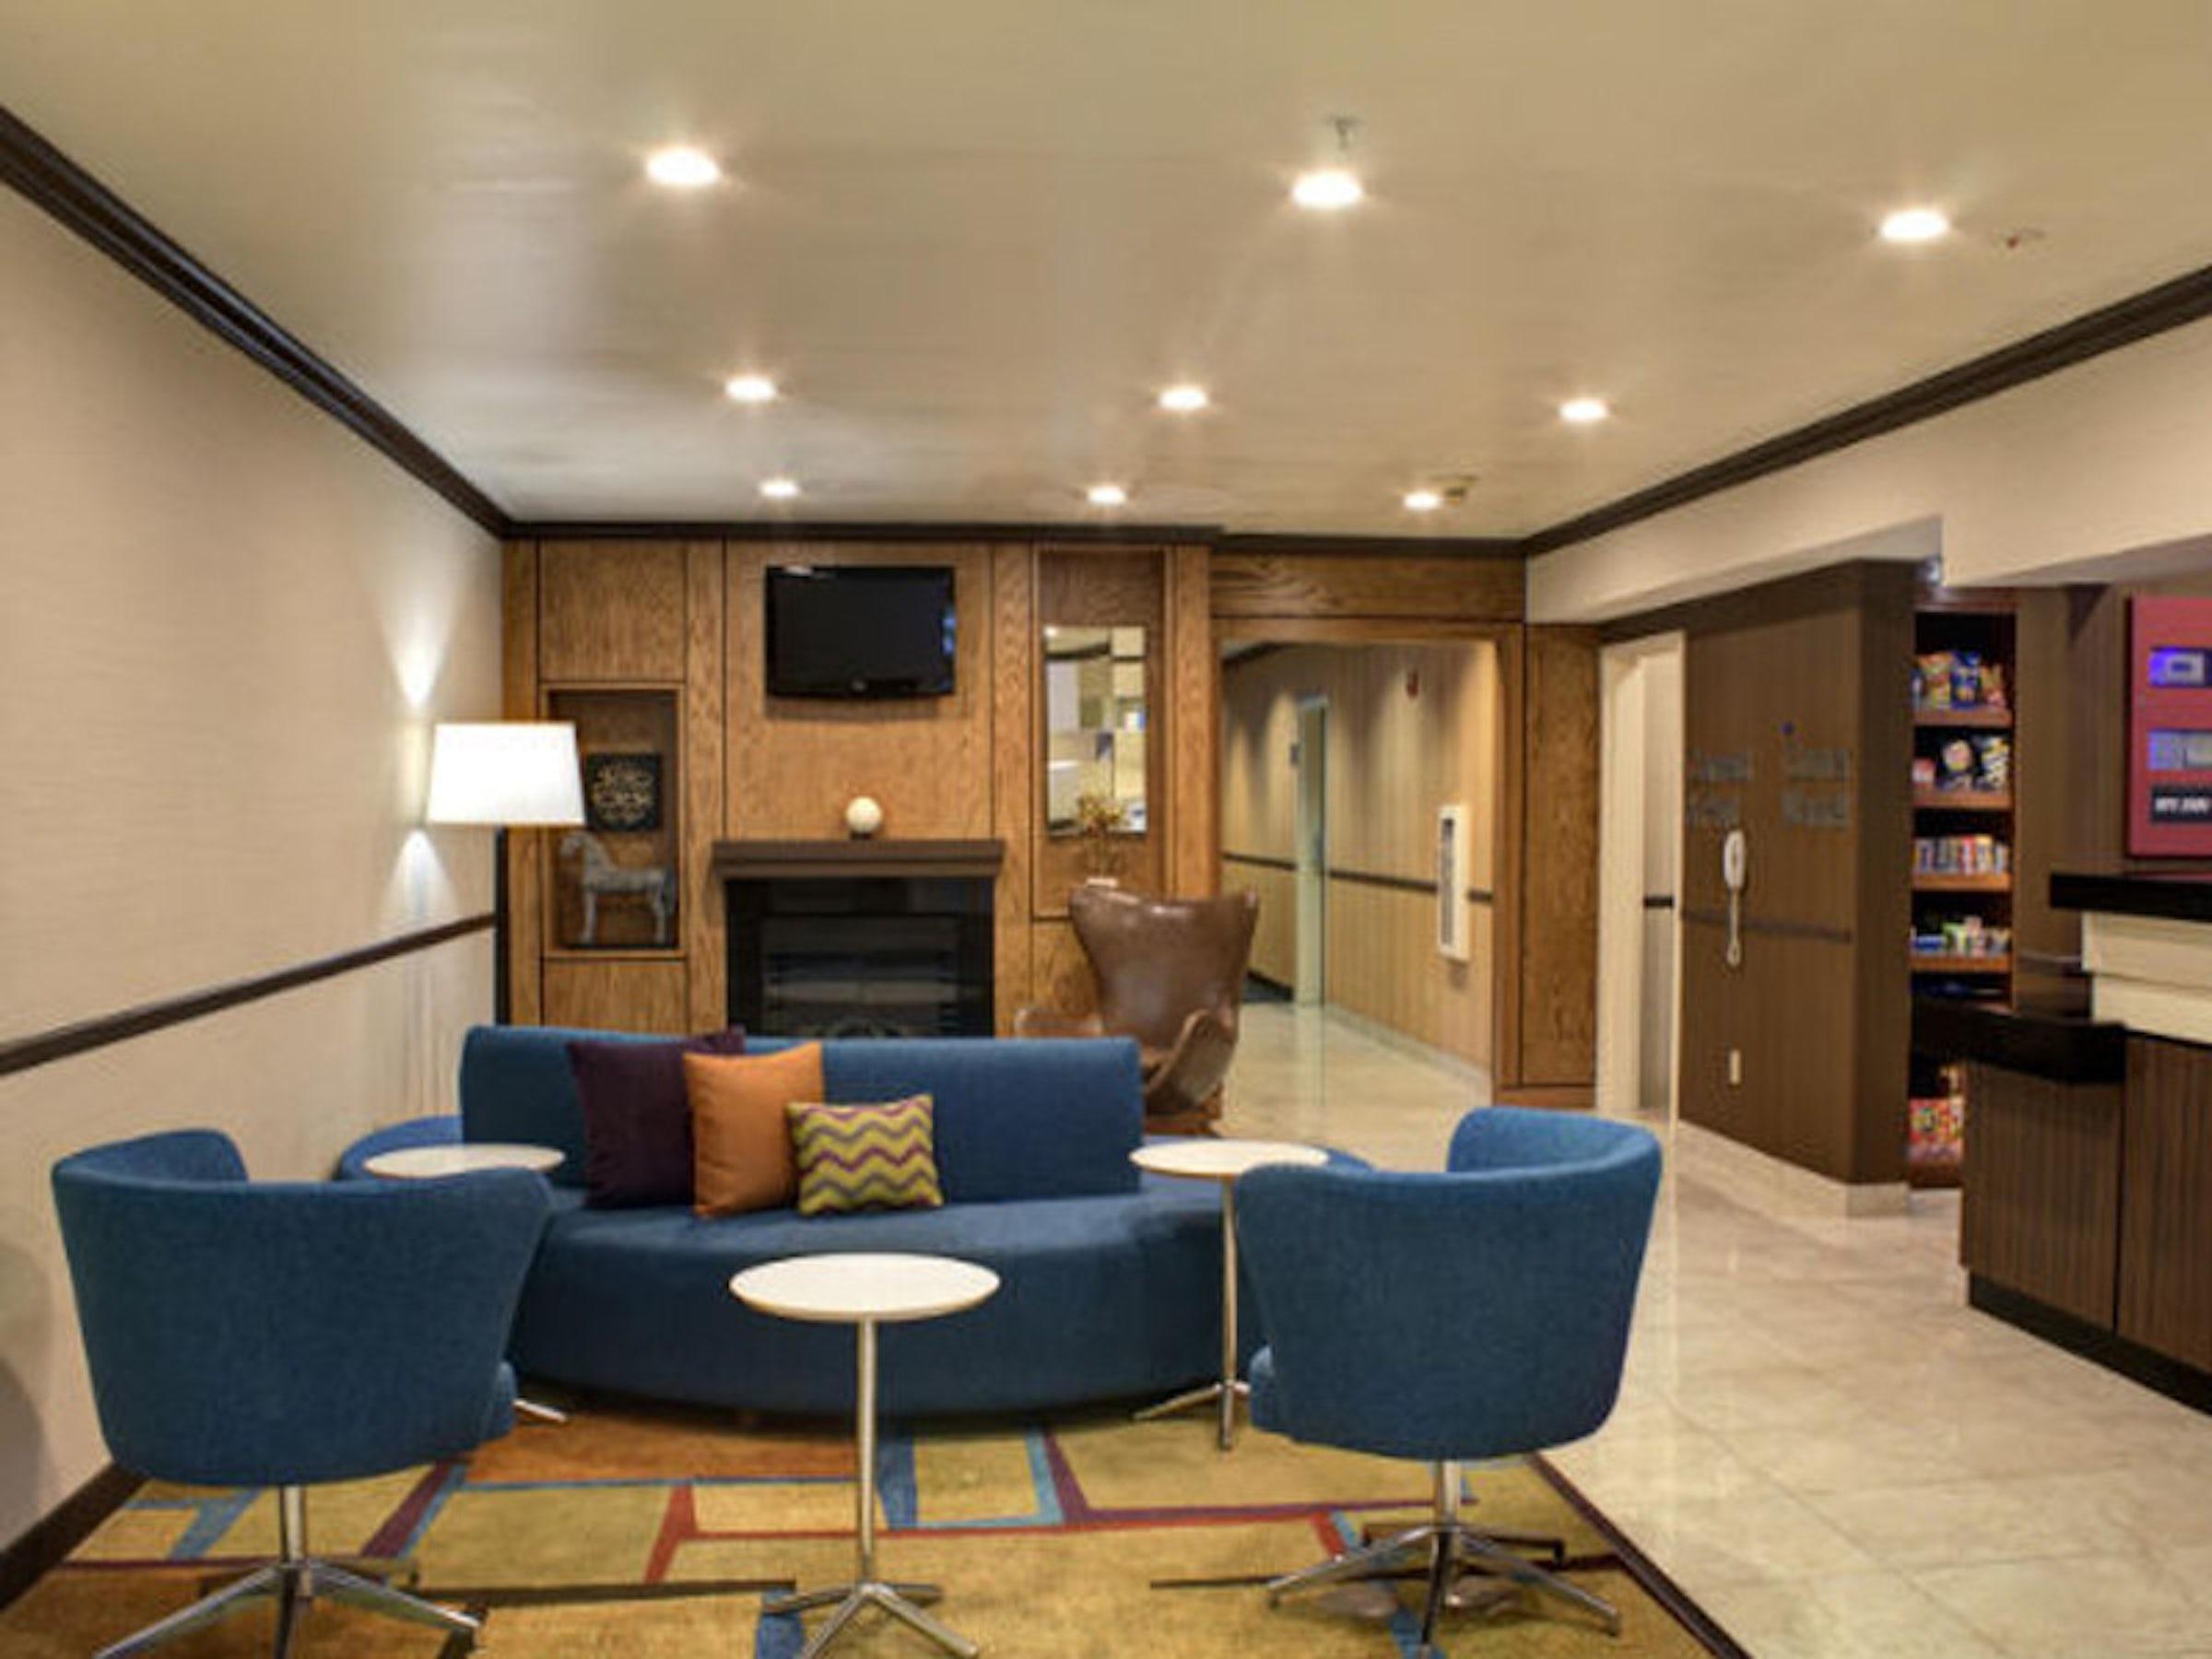 Comfort Inn & Suites Dallas-Addison in Beyond Dallas